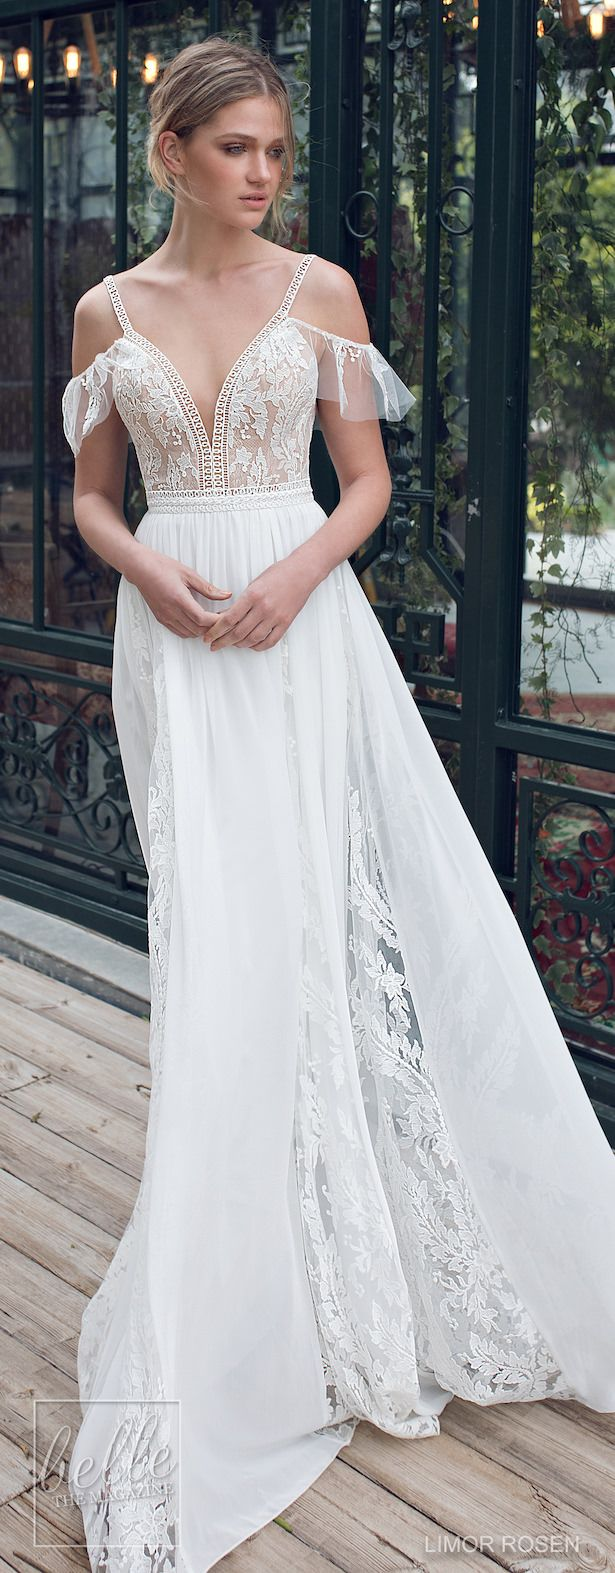 Lace dress bell sleeves june 2019  best Braut Kleider u Anderes images on Pinterest  Wedding